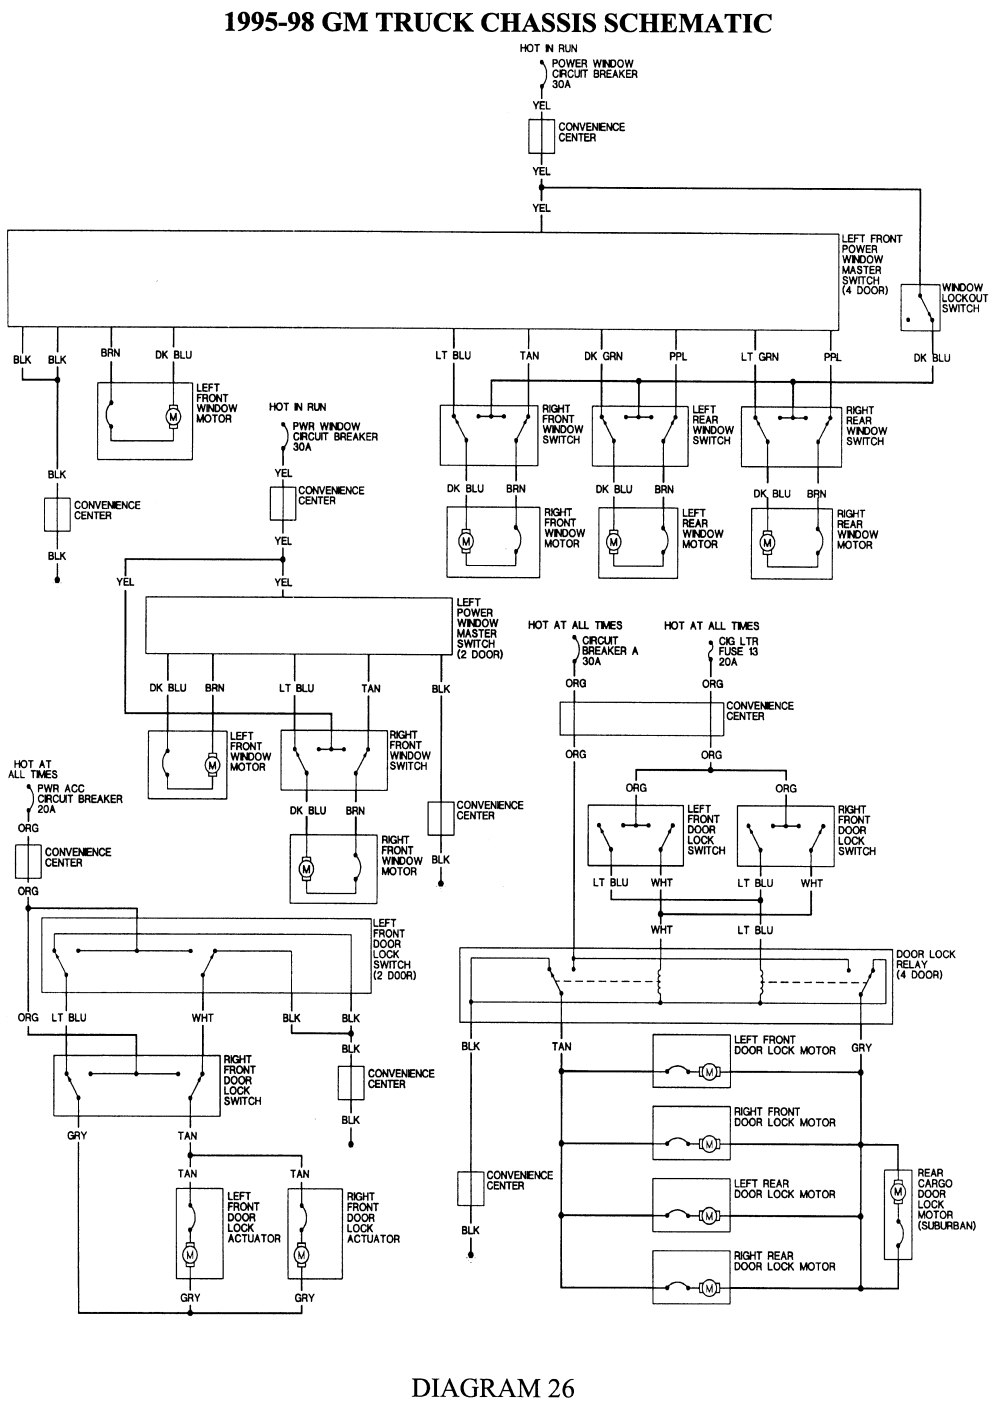 wiring diagram for 1988 chevy silverado radio catalogue of  1988 chevrolet wiring diagram #13